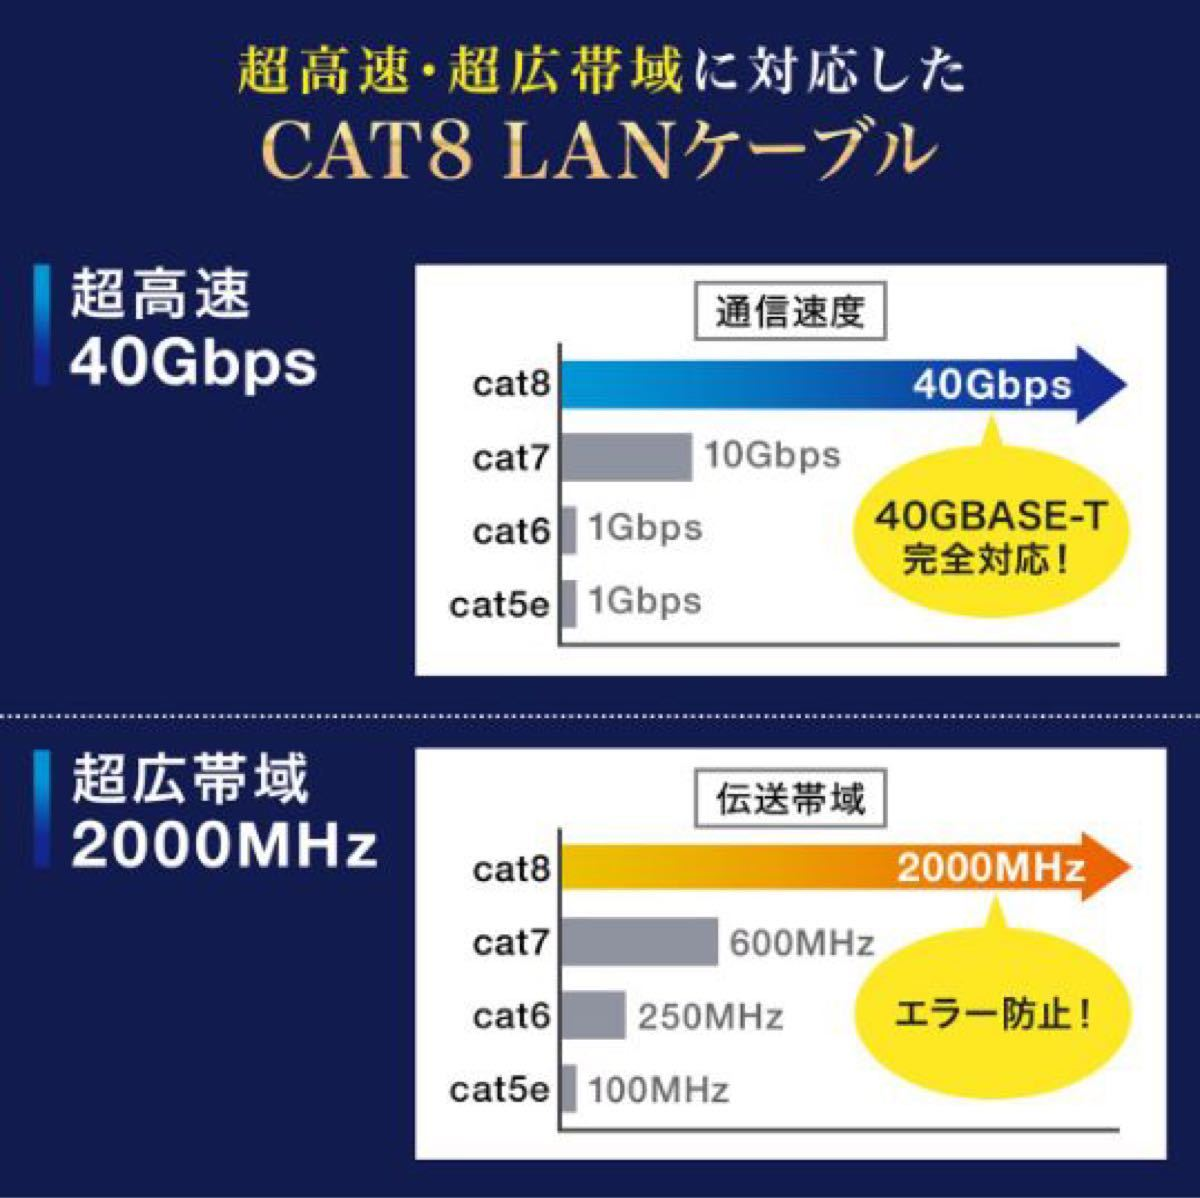 LANケーブル 25m CAT8 40ギガビット 超高速通信対応新品未使用光回線